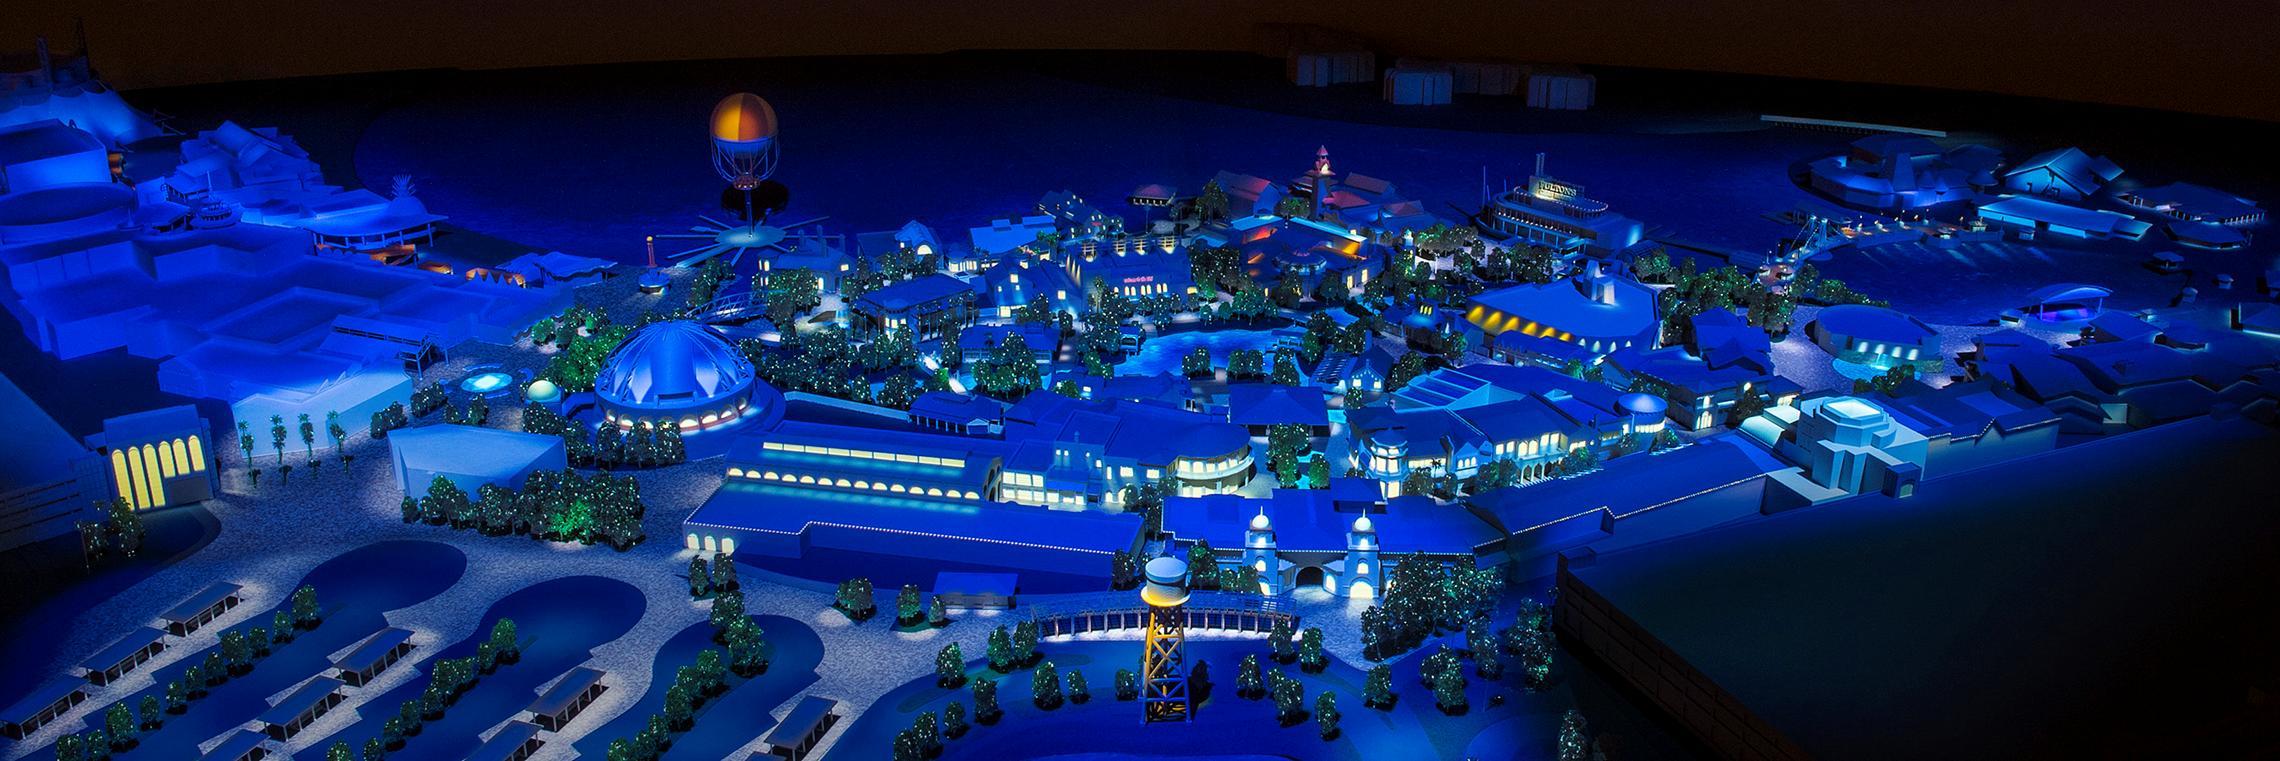 Disney Springs nighttime view concept art